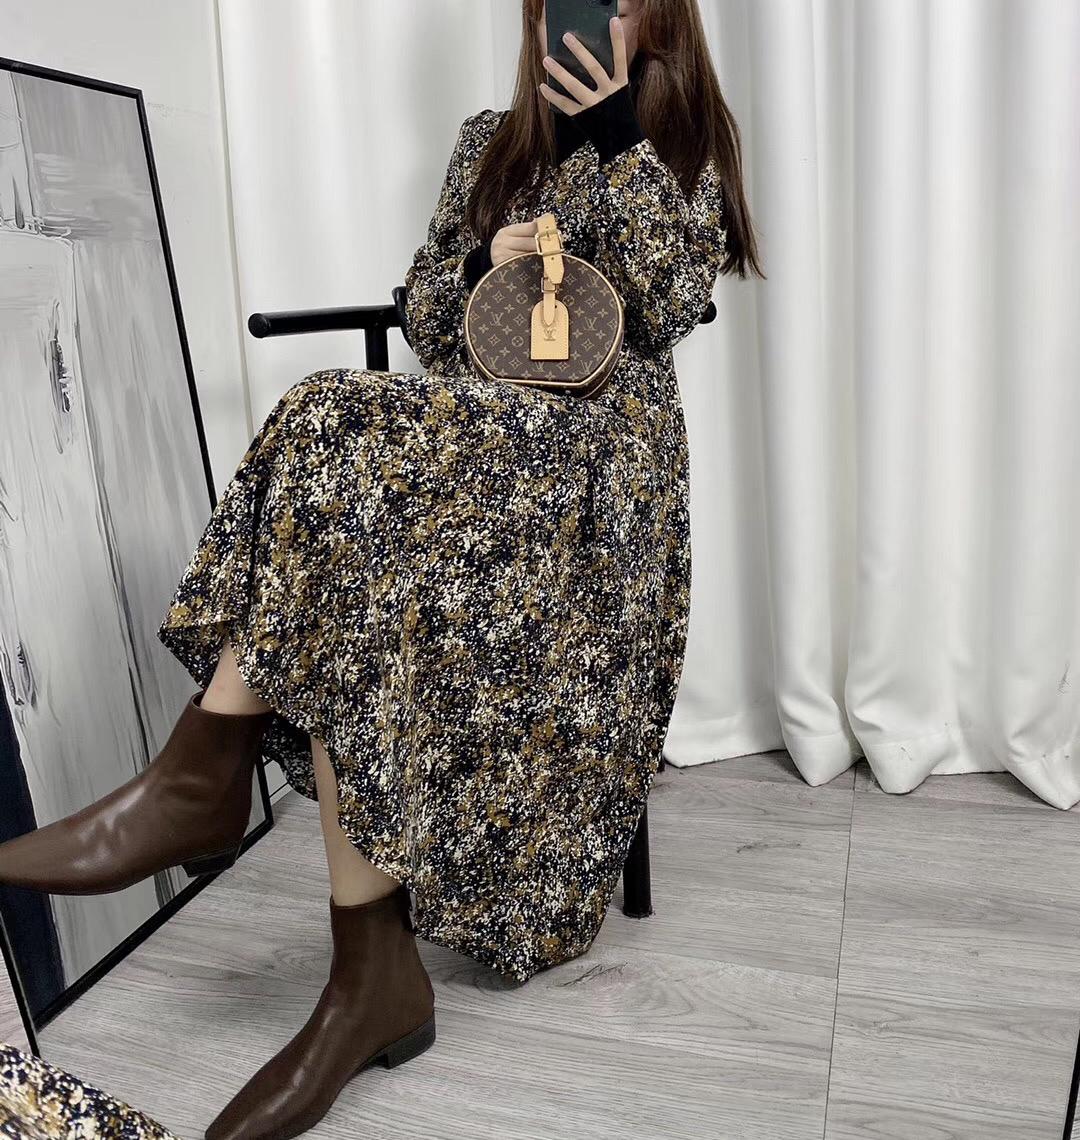 ASM Anna 〕 Monets back garden ~ foreign style fashionable dress childrens winter flower dress